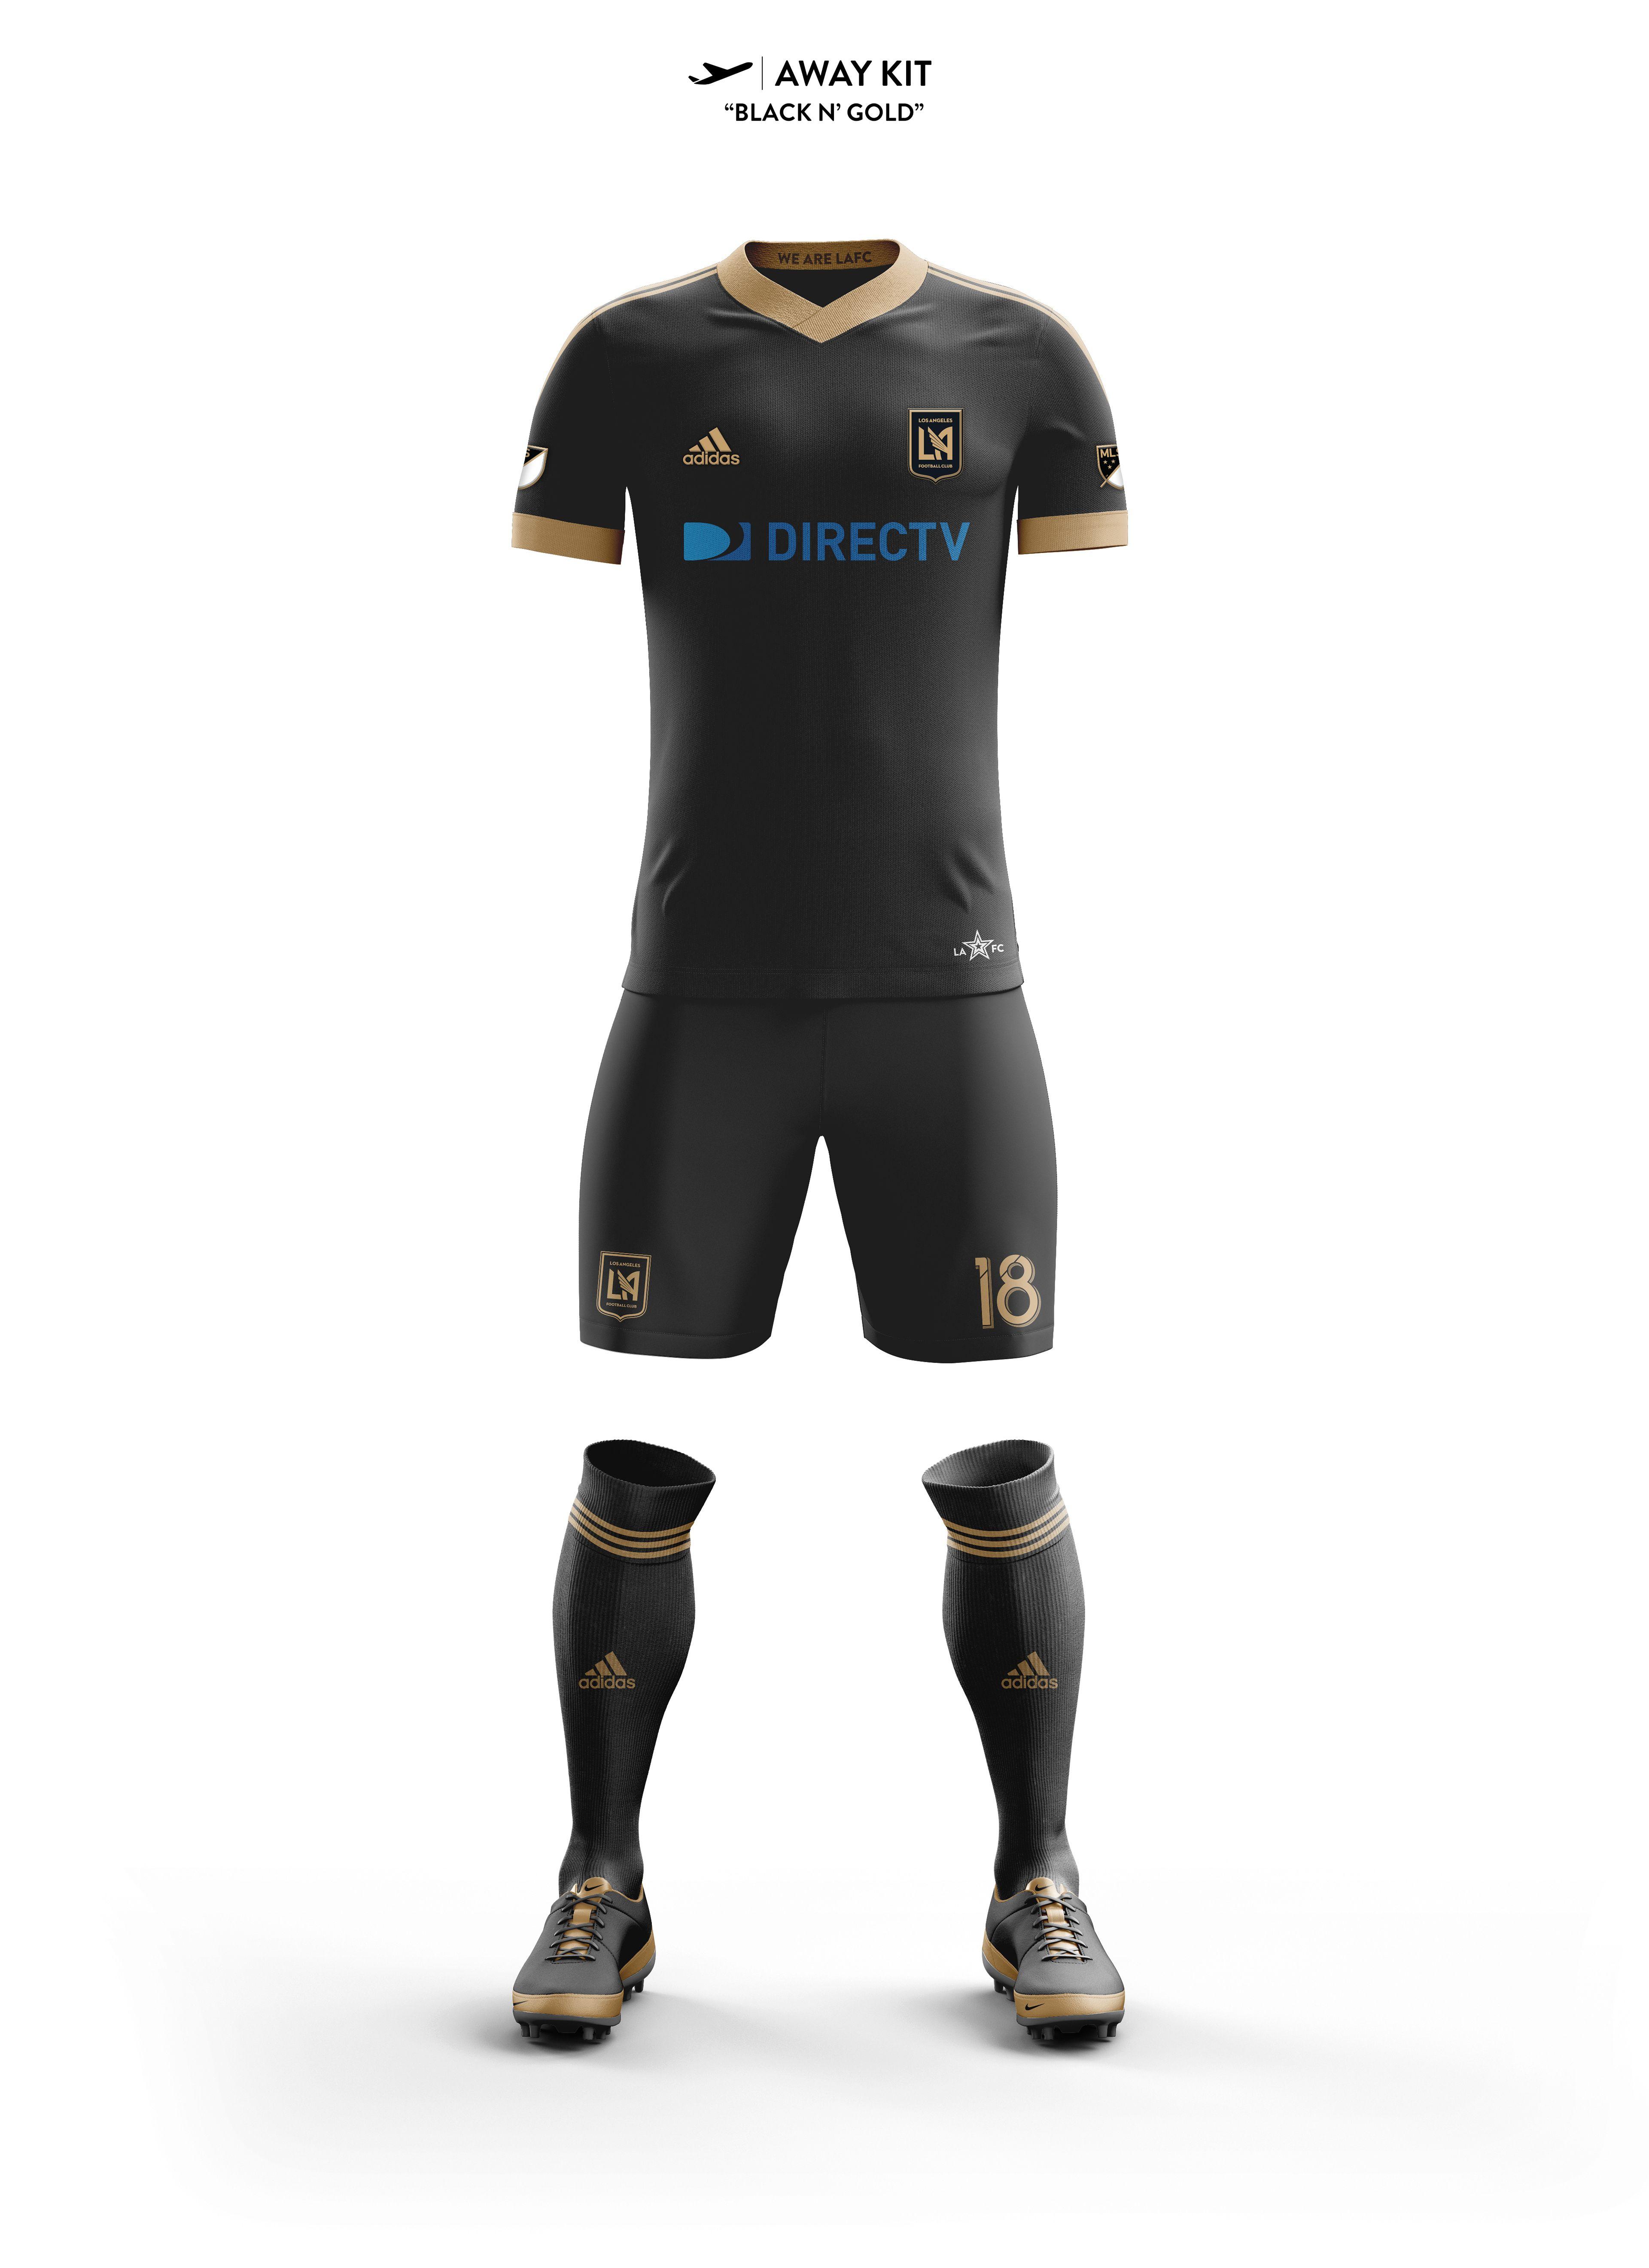 a8db82791e3 Los Angeles Football Club Concept Kits on Behance